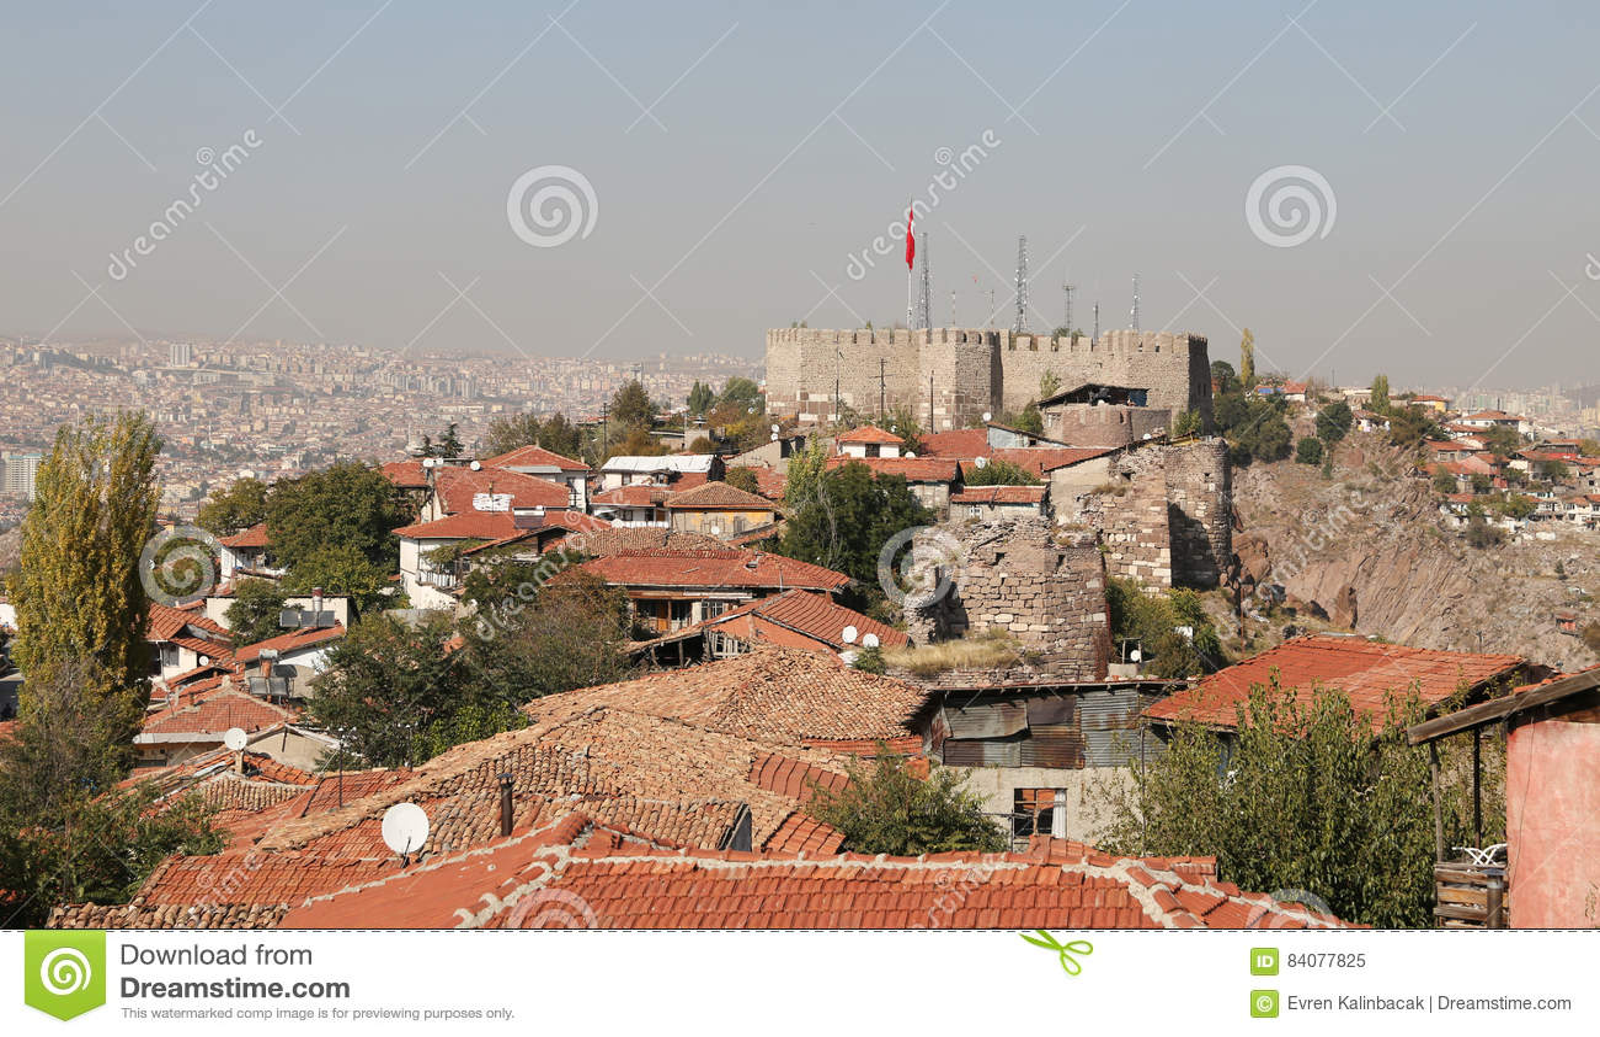 Ankara Castle In Turkey Stock Photo - Image: 84077825